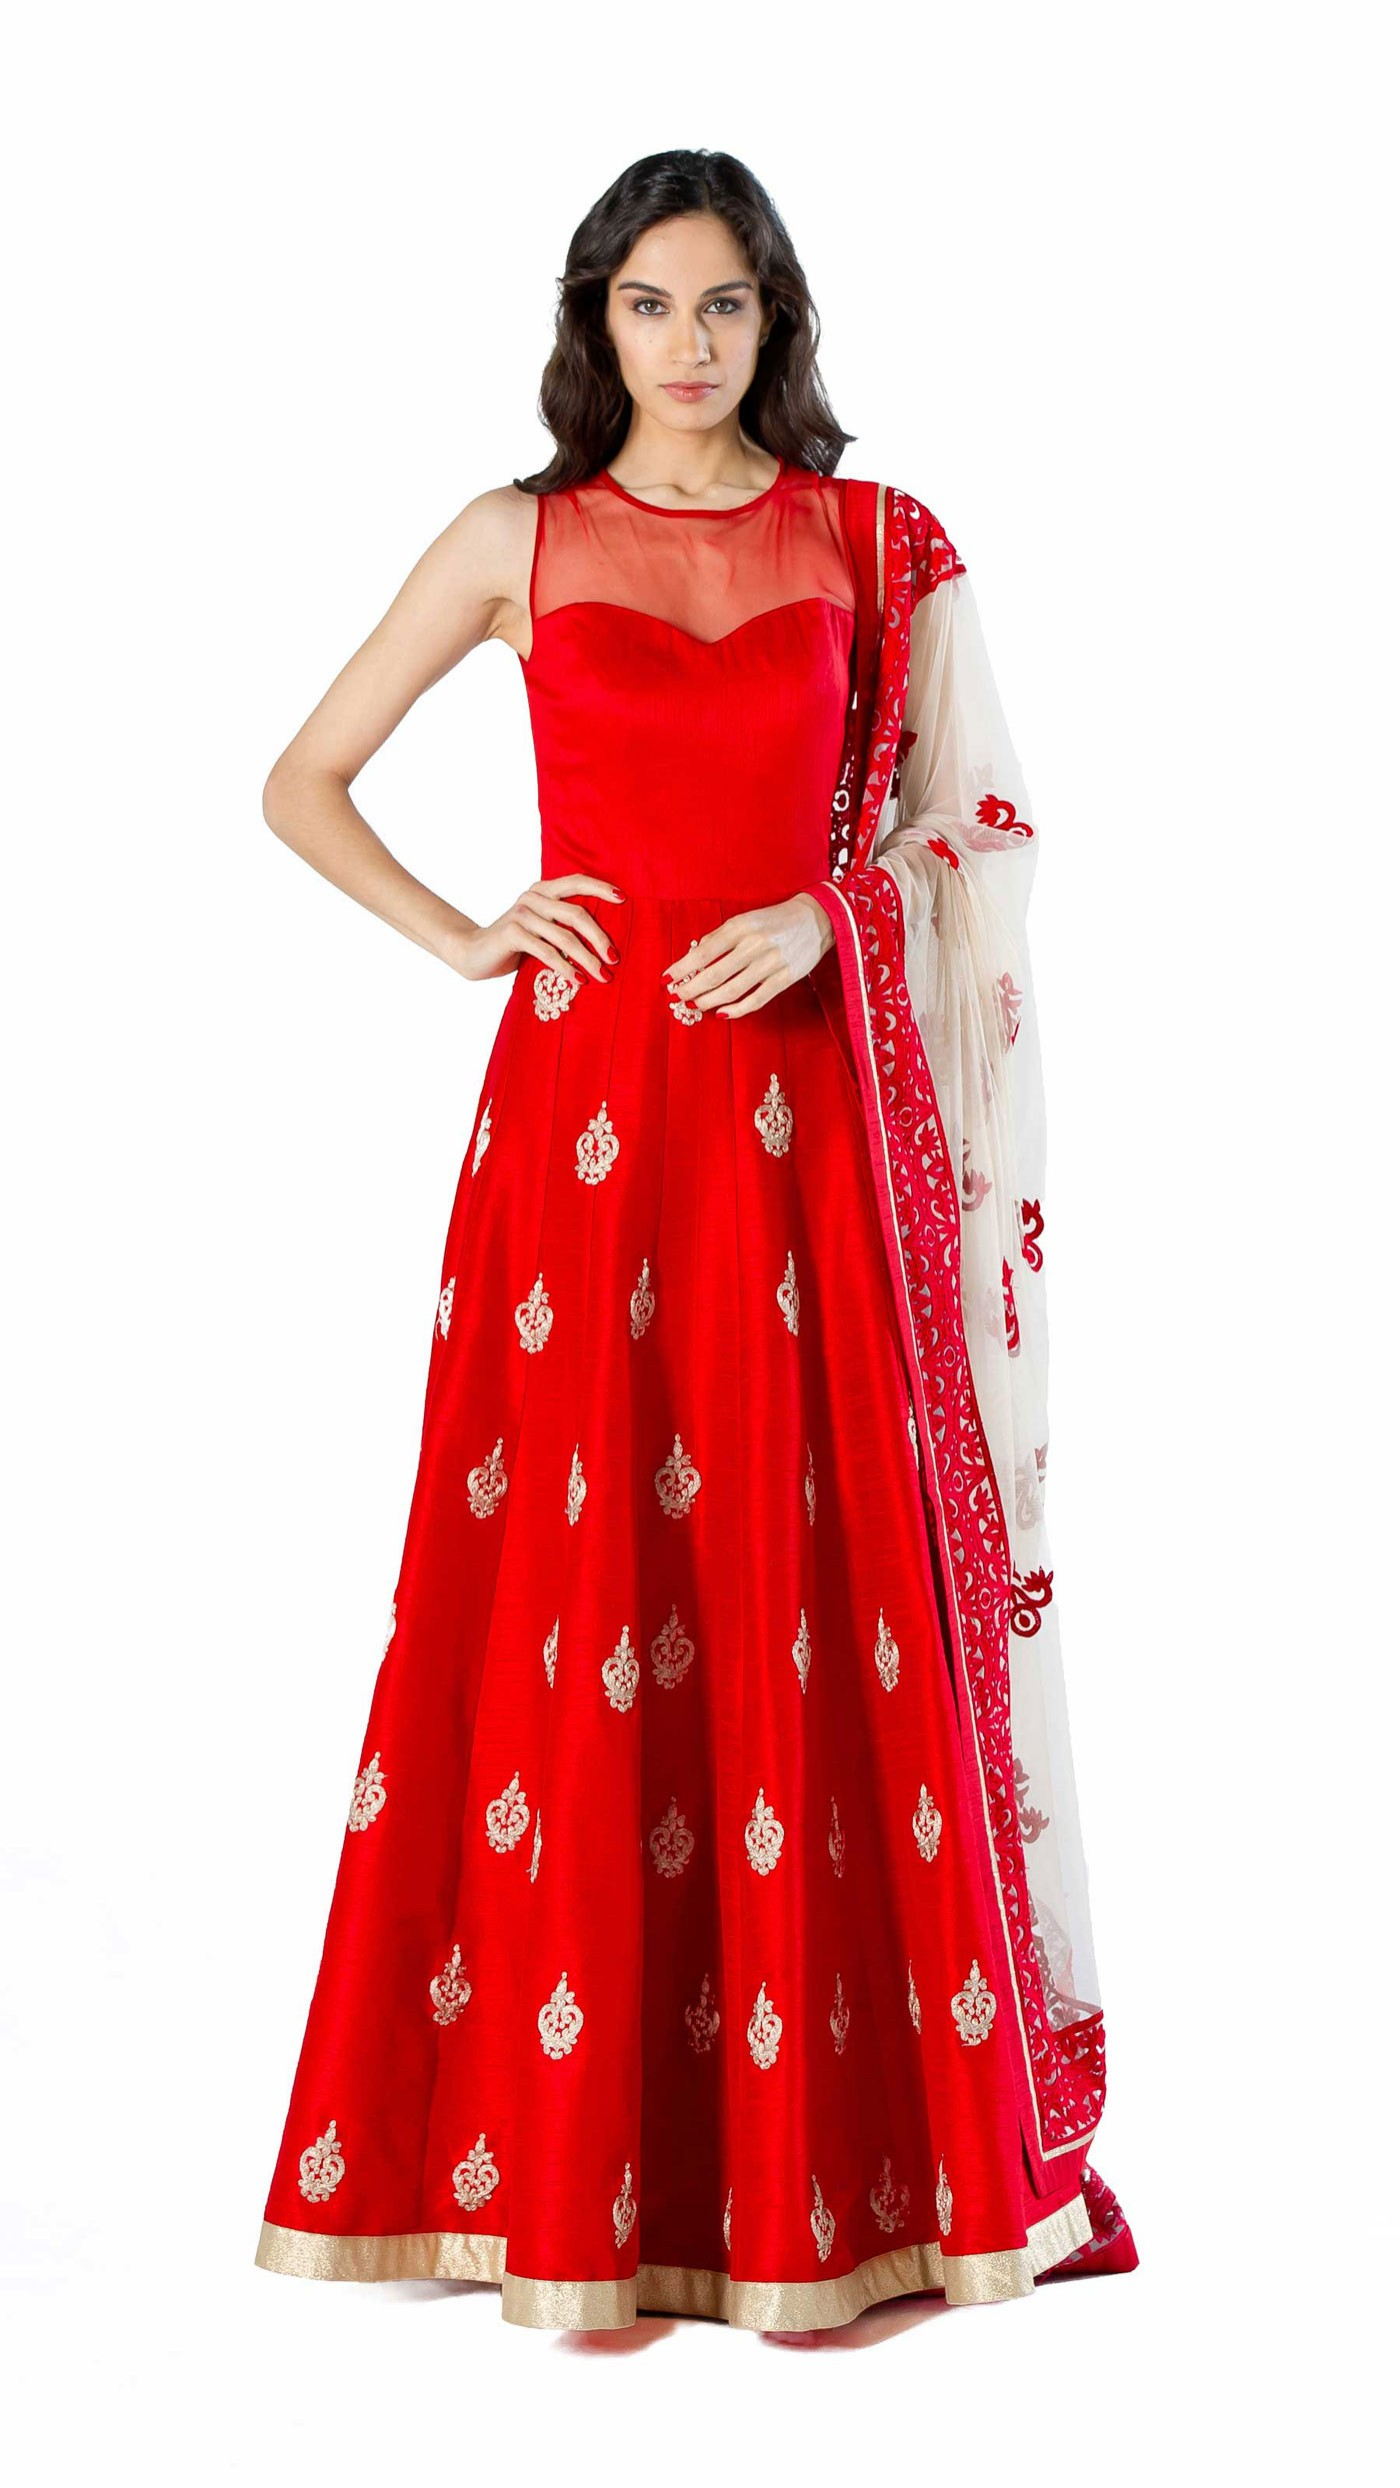 SVA by Sonam & Paras Modi\'s Red Raw Silk Gown